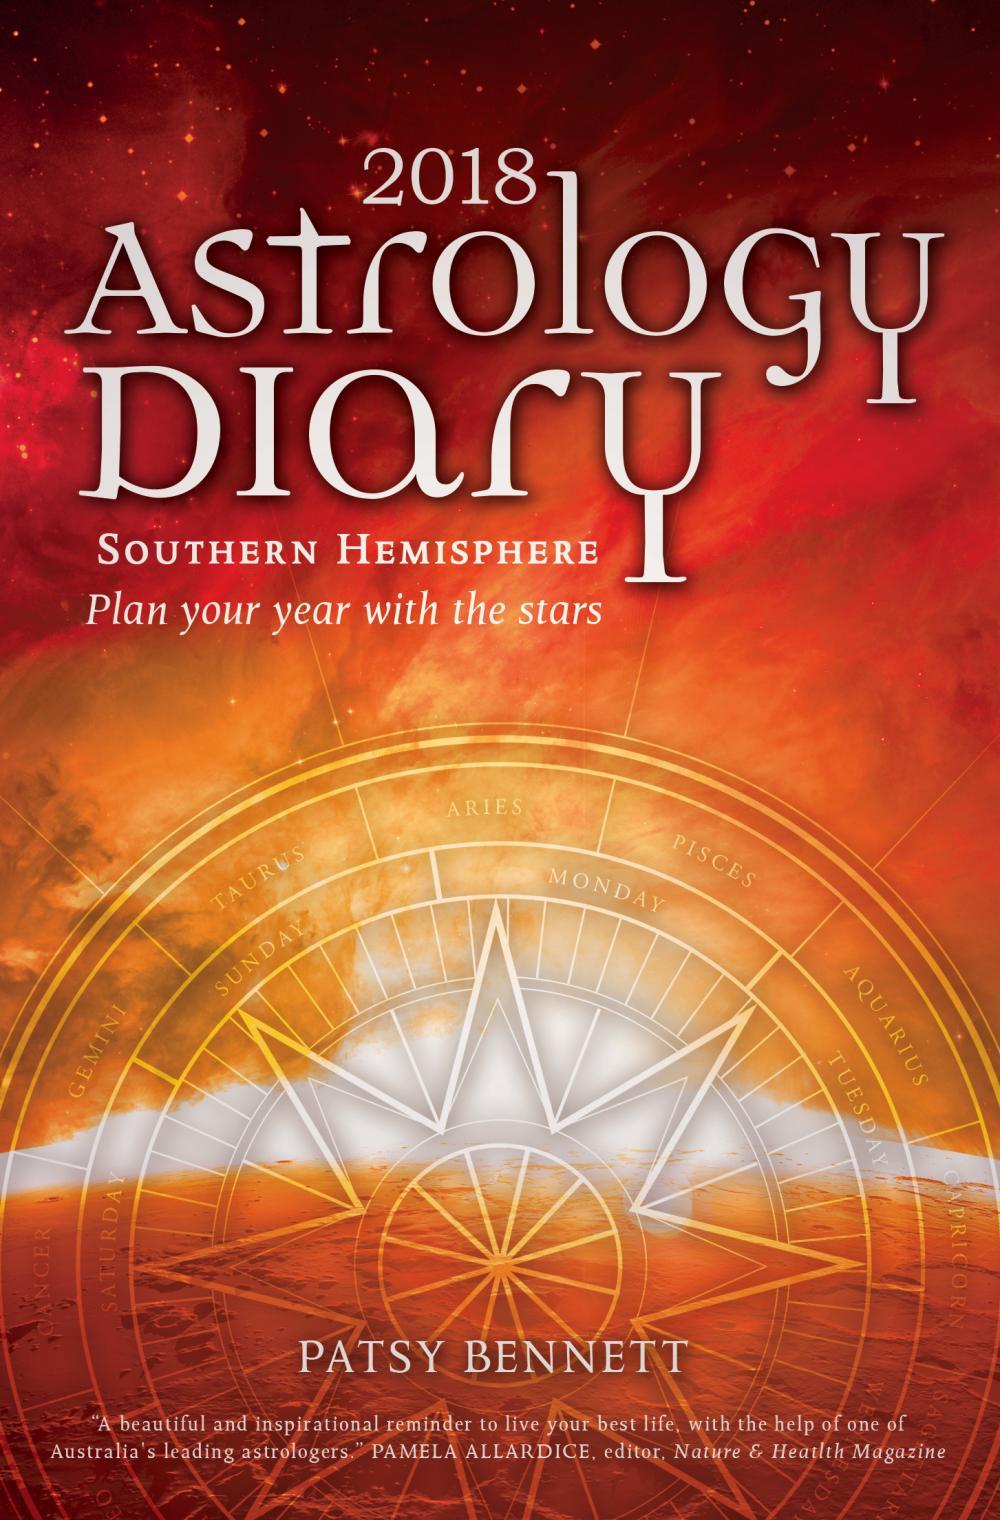 2018 Astrology Diary - Southern Hemisphe